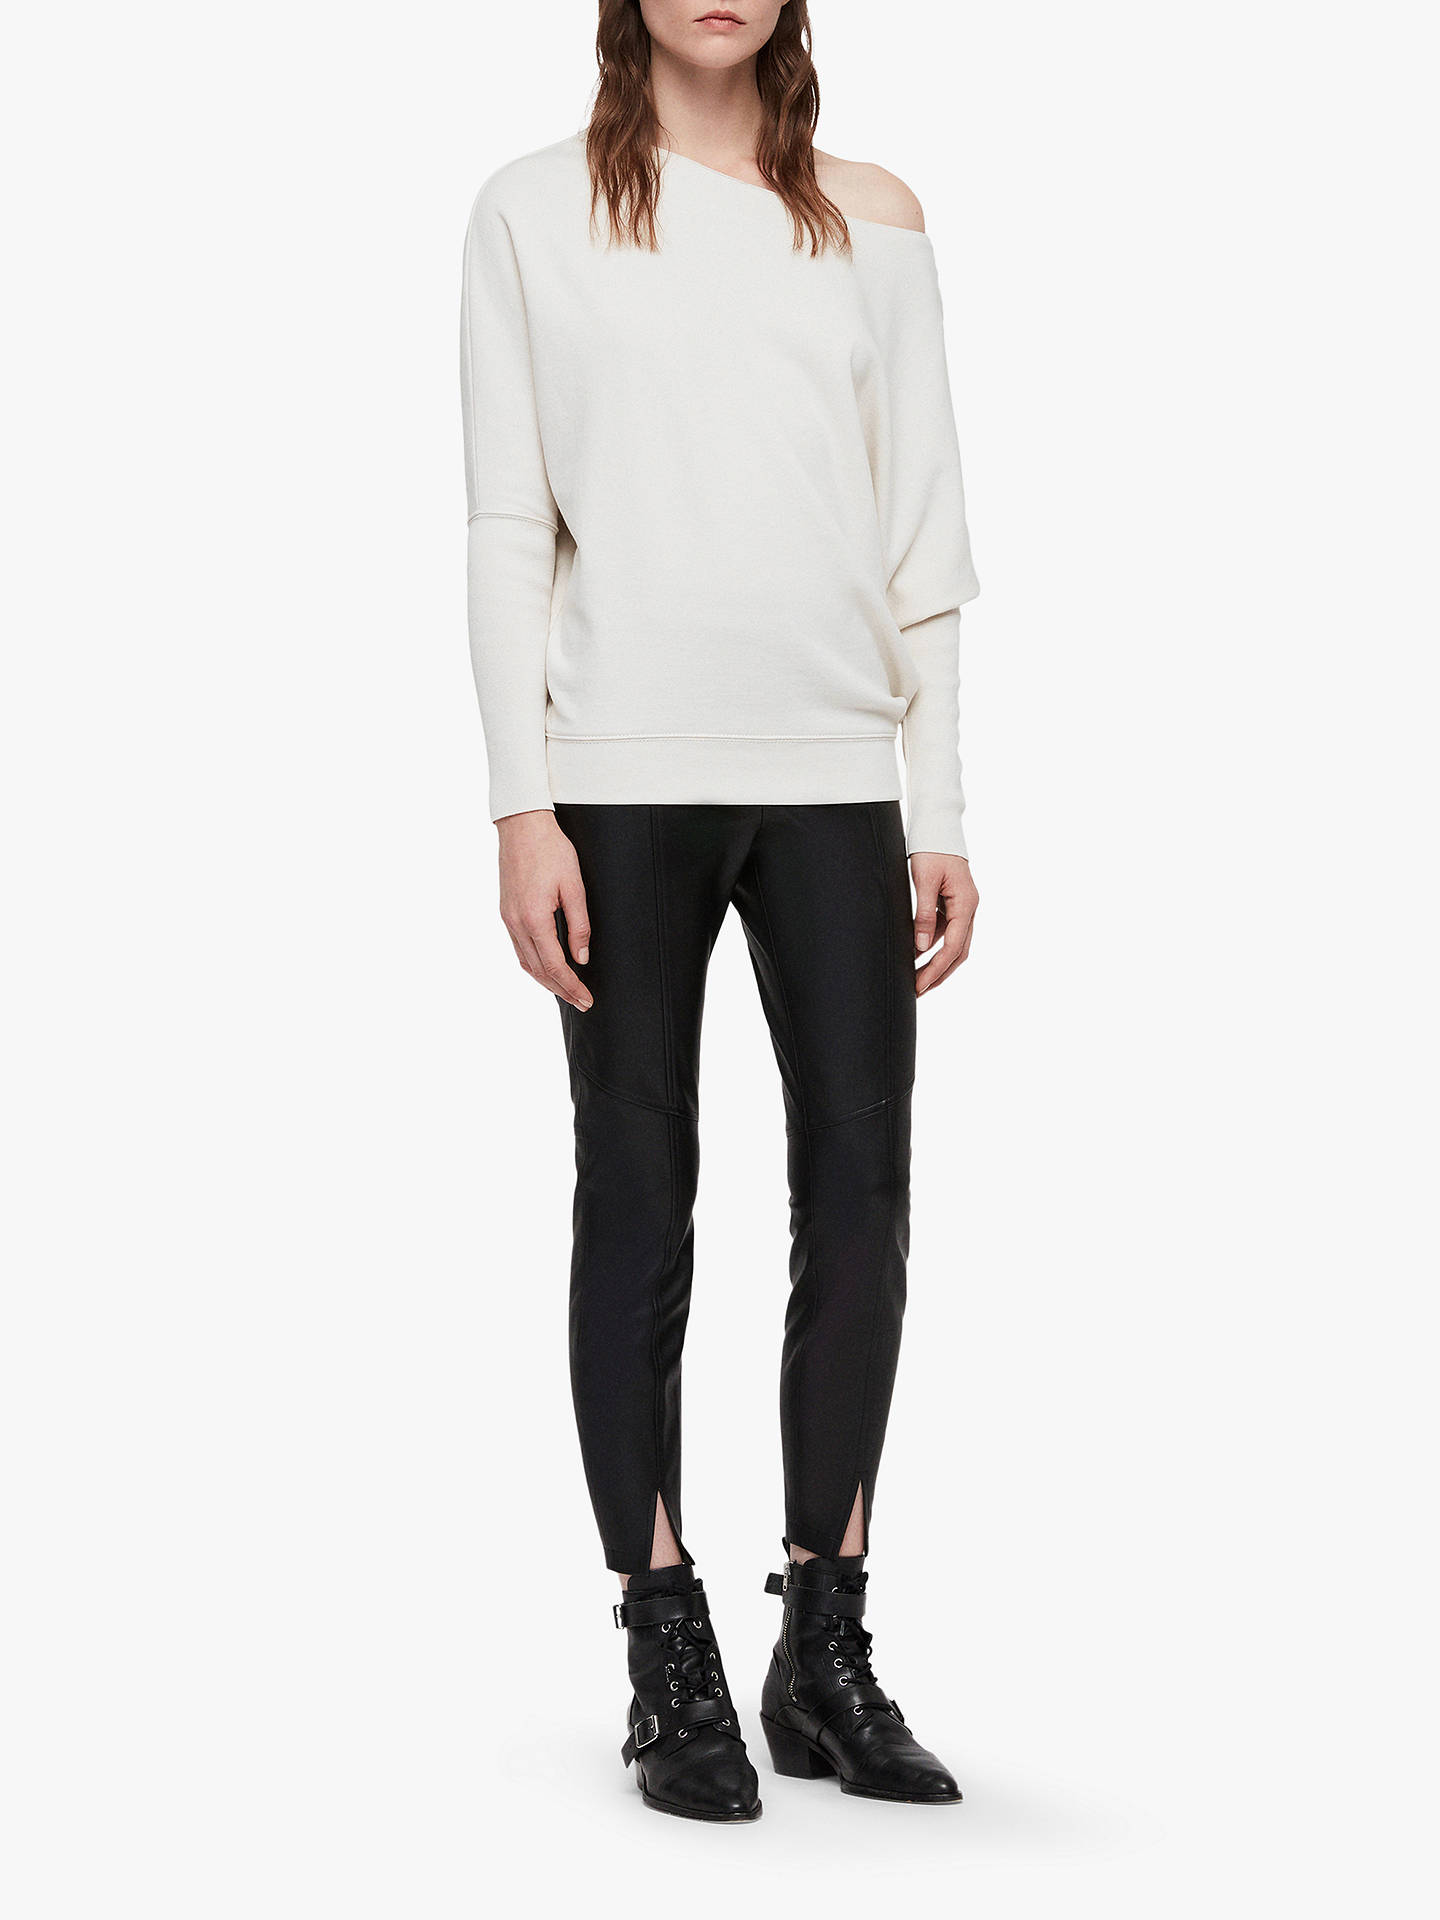 Allsaints Ridley Sweatshirt Ivory White At John Lewis Partners